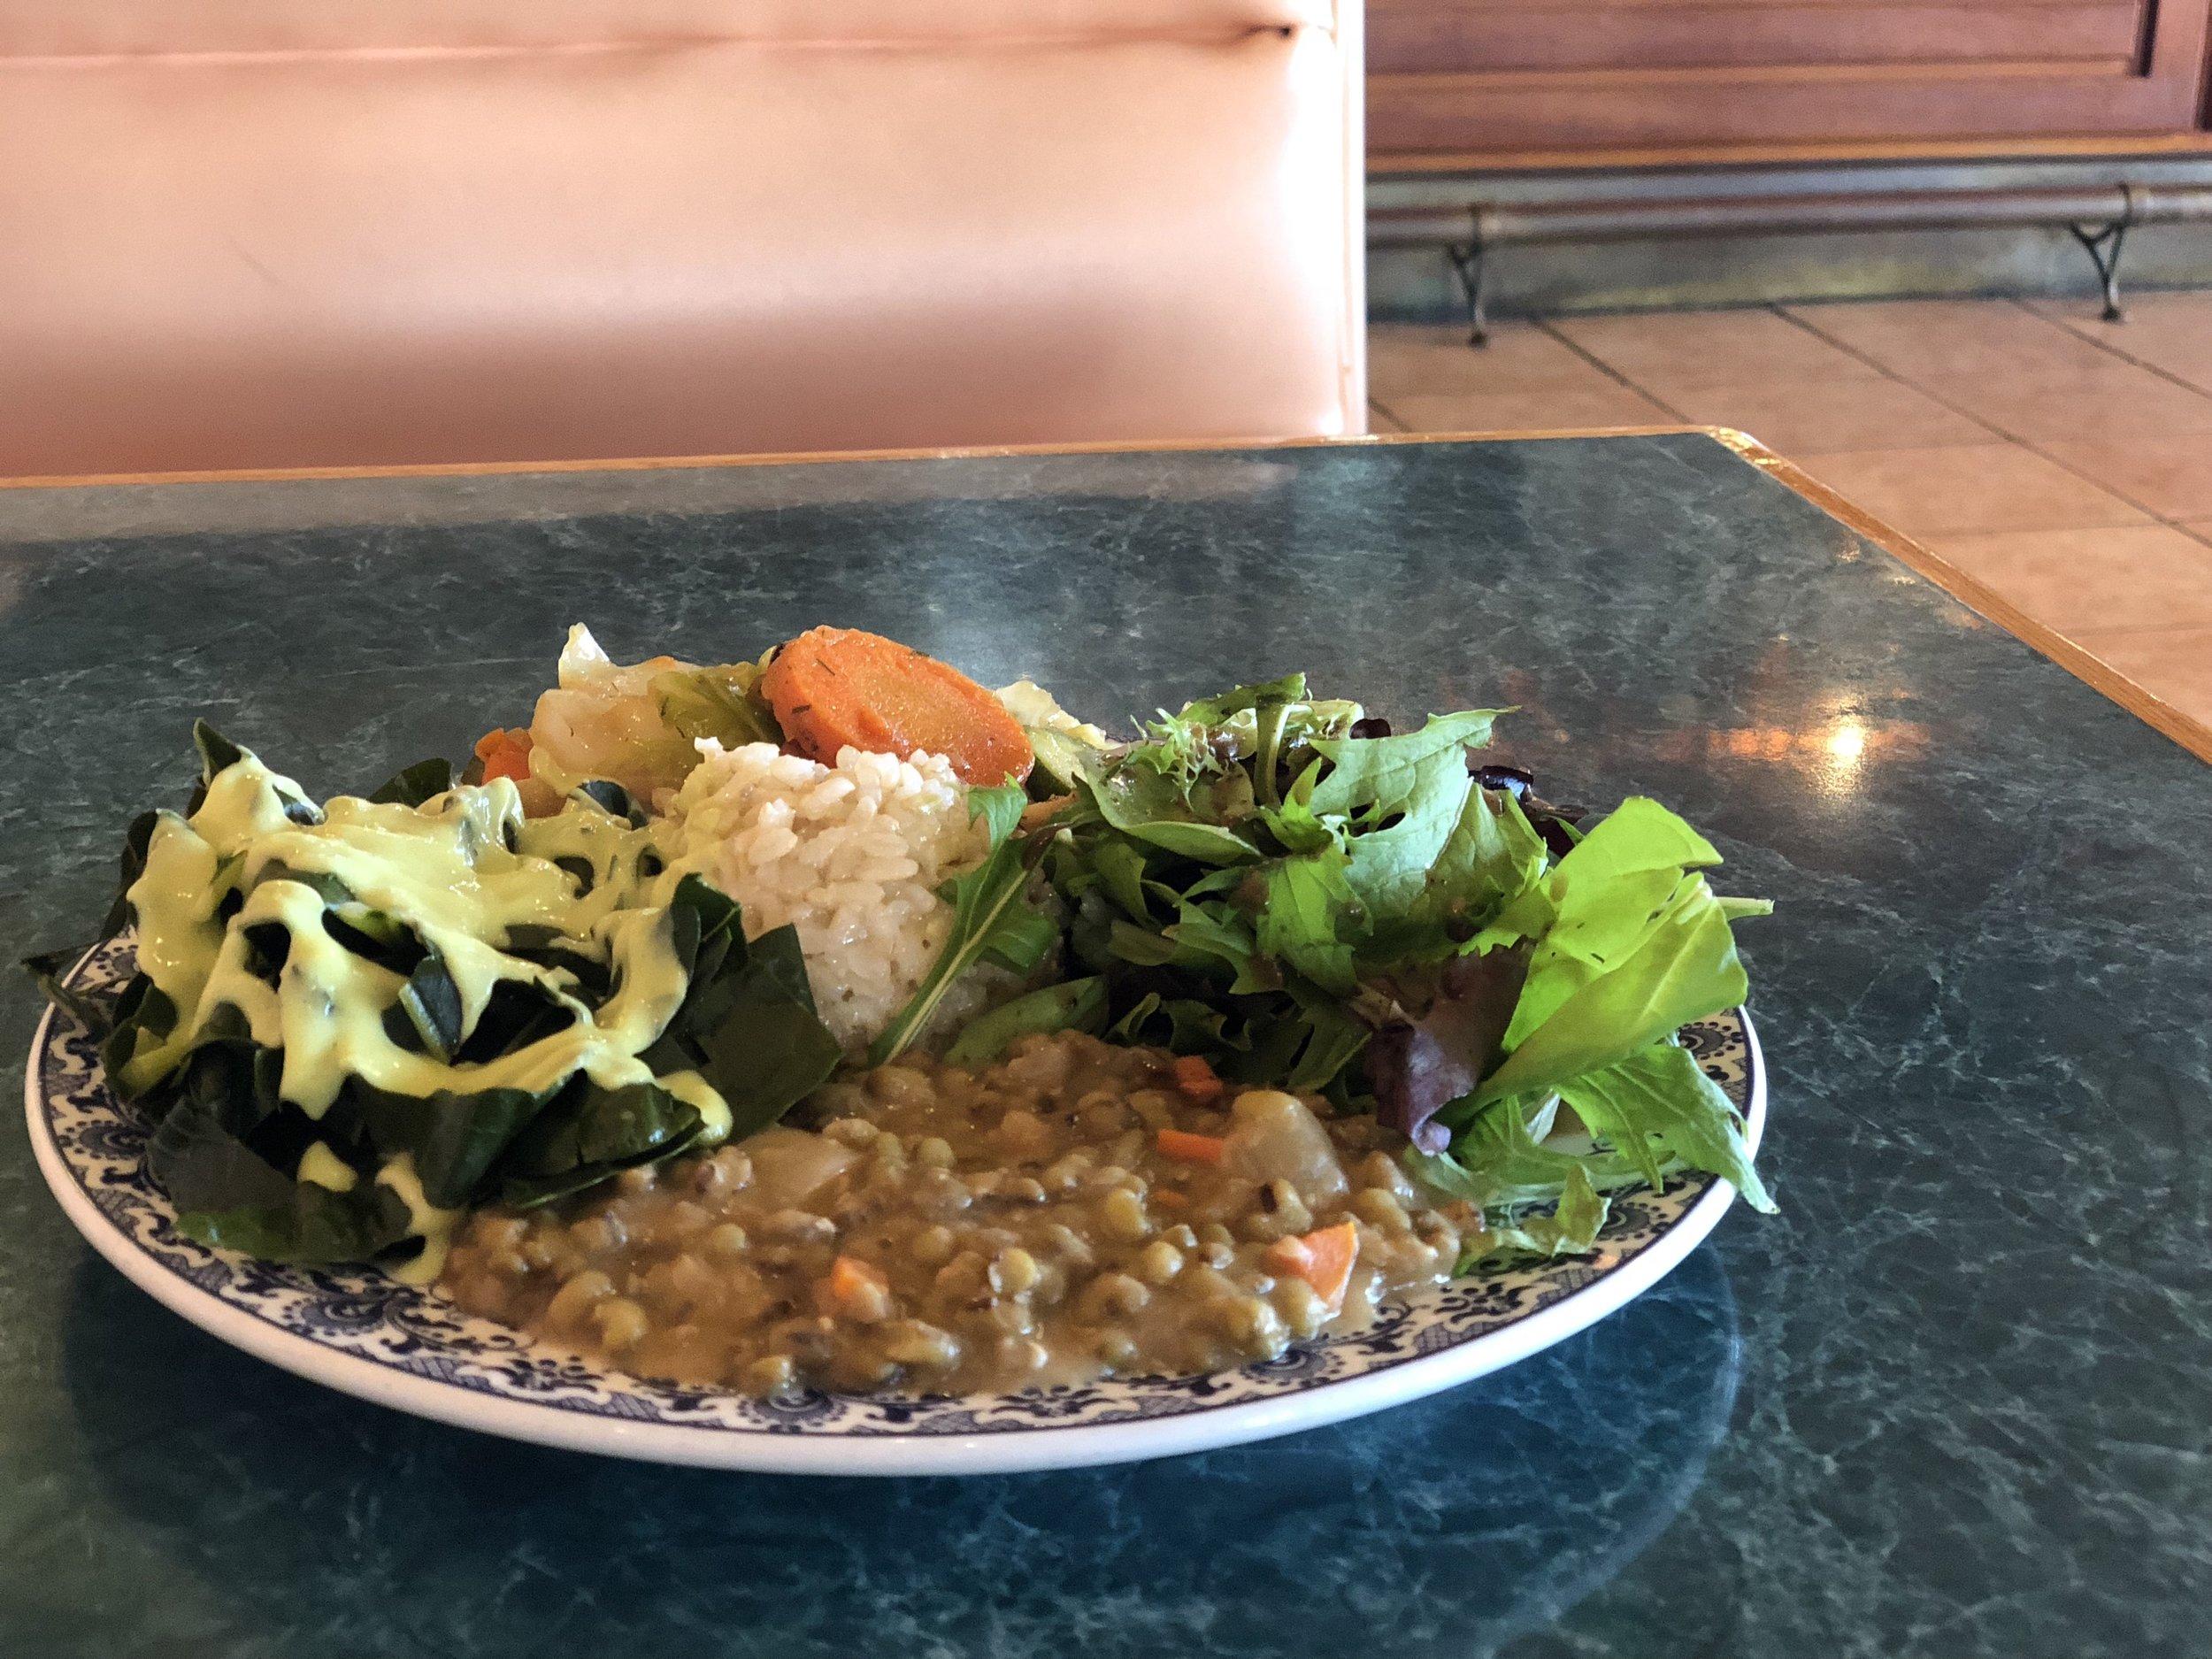 brown rice, mung bean w/onions, sautéed green cabbage, zucchini, carrot & potato, steamed collards with tofu-avocado sauce, mixed green salad